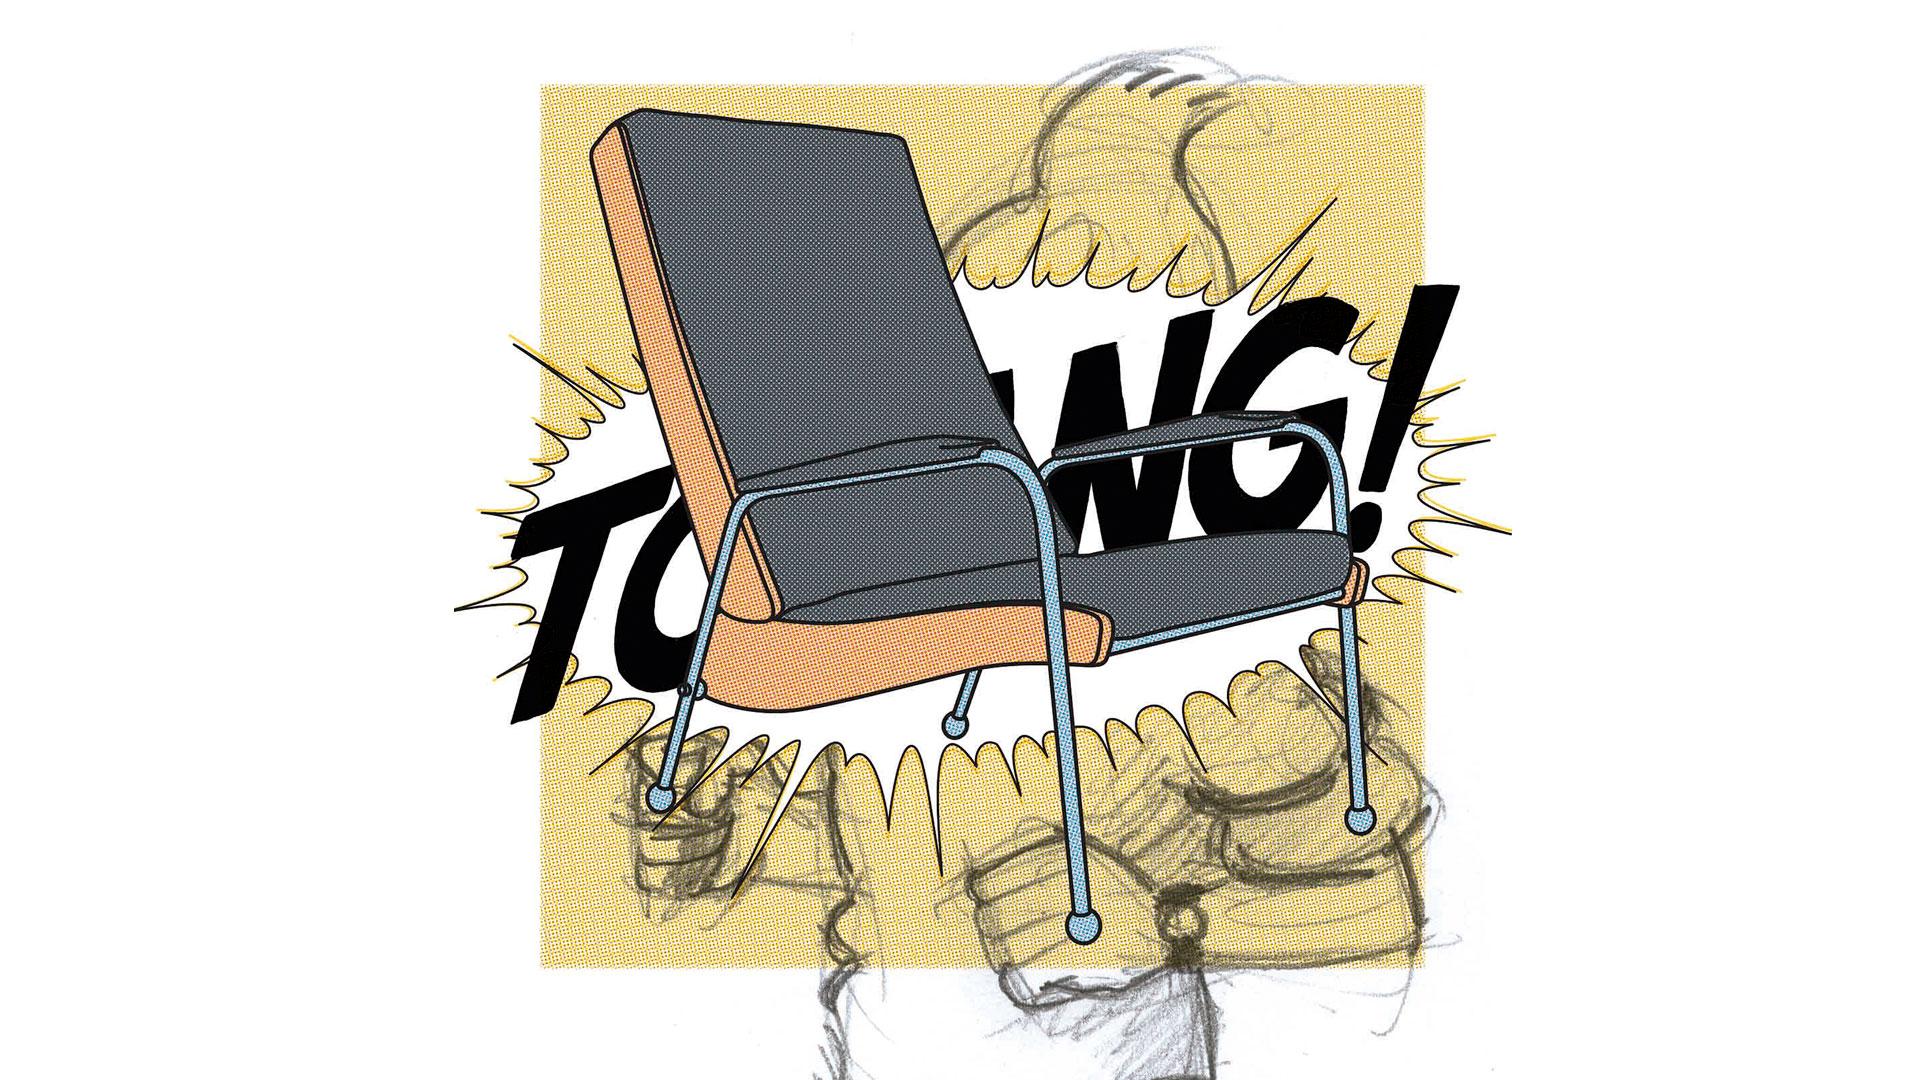 Las sillas como objeto de inspiración hero asset